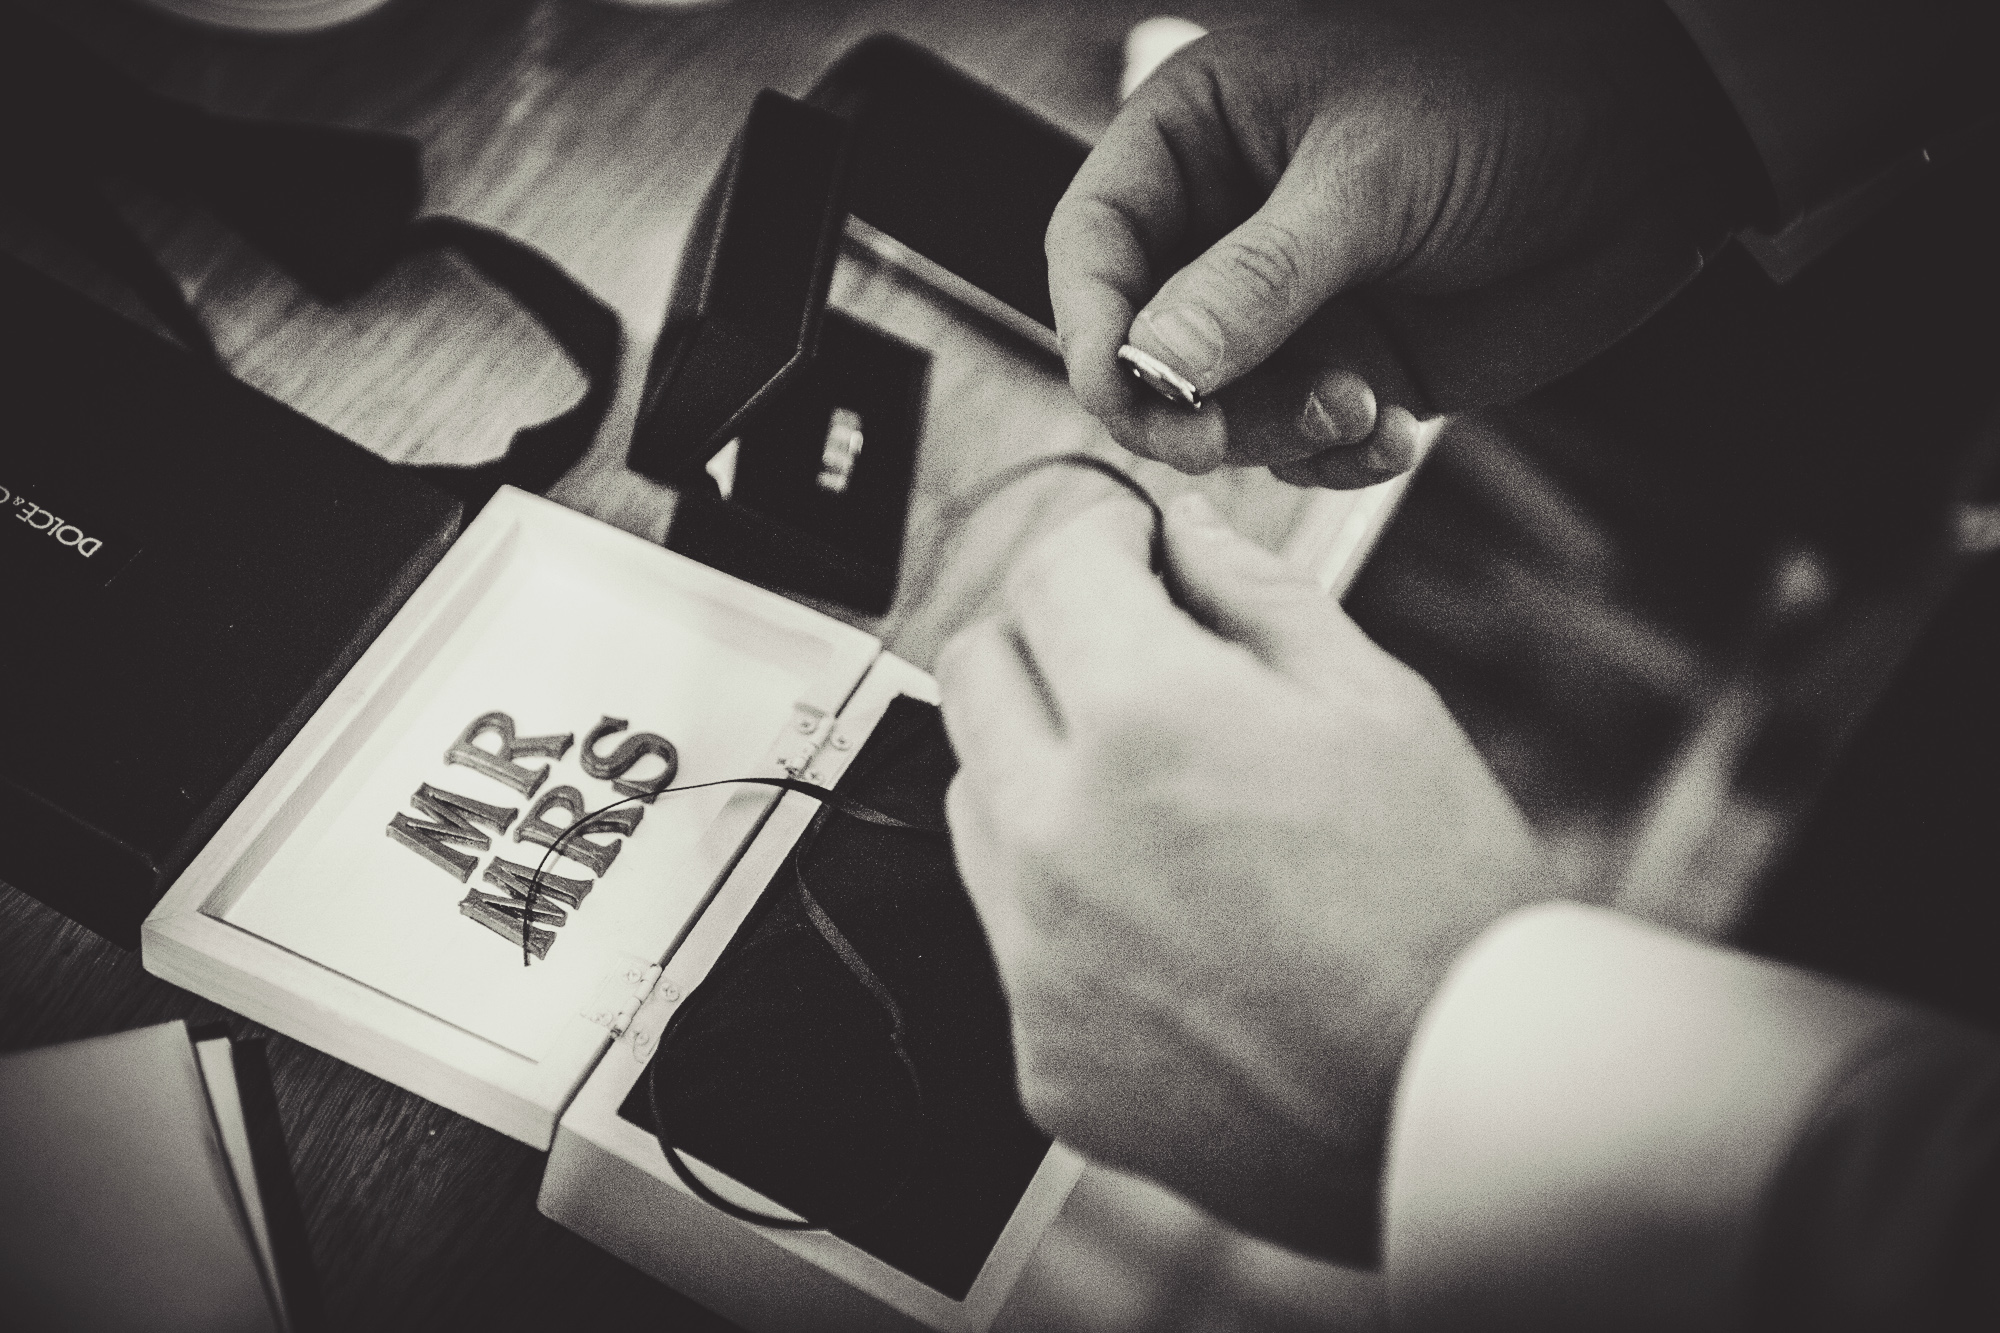 WEDDING_STATIONERY_BOXES_14.jpg